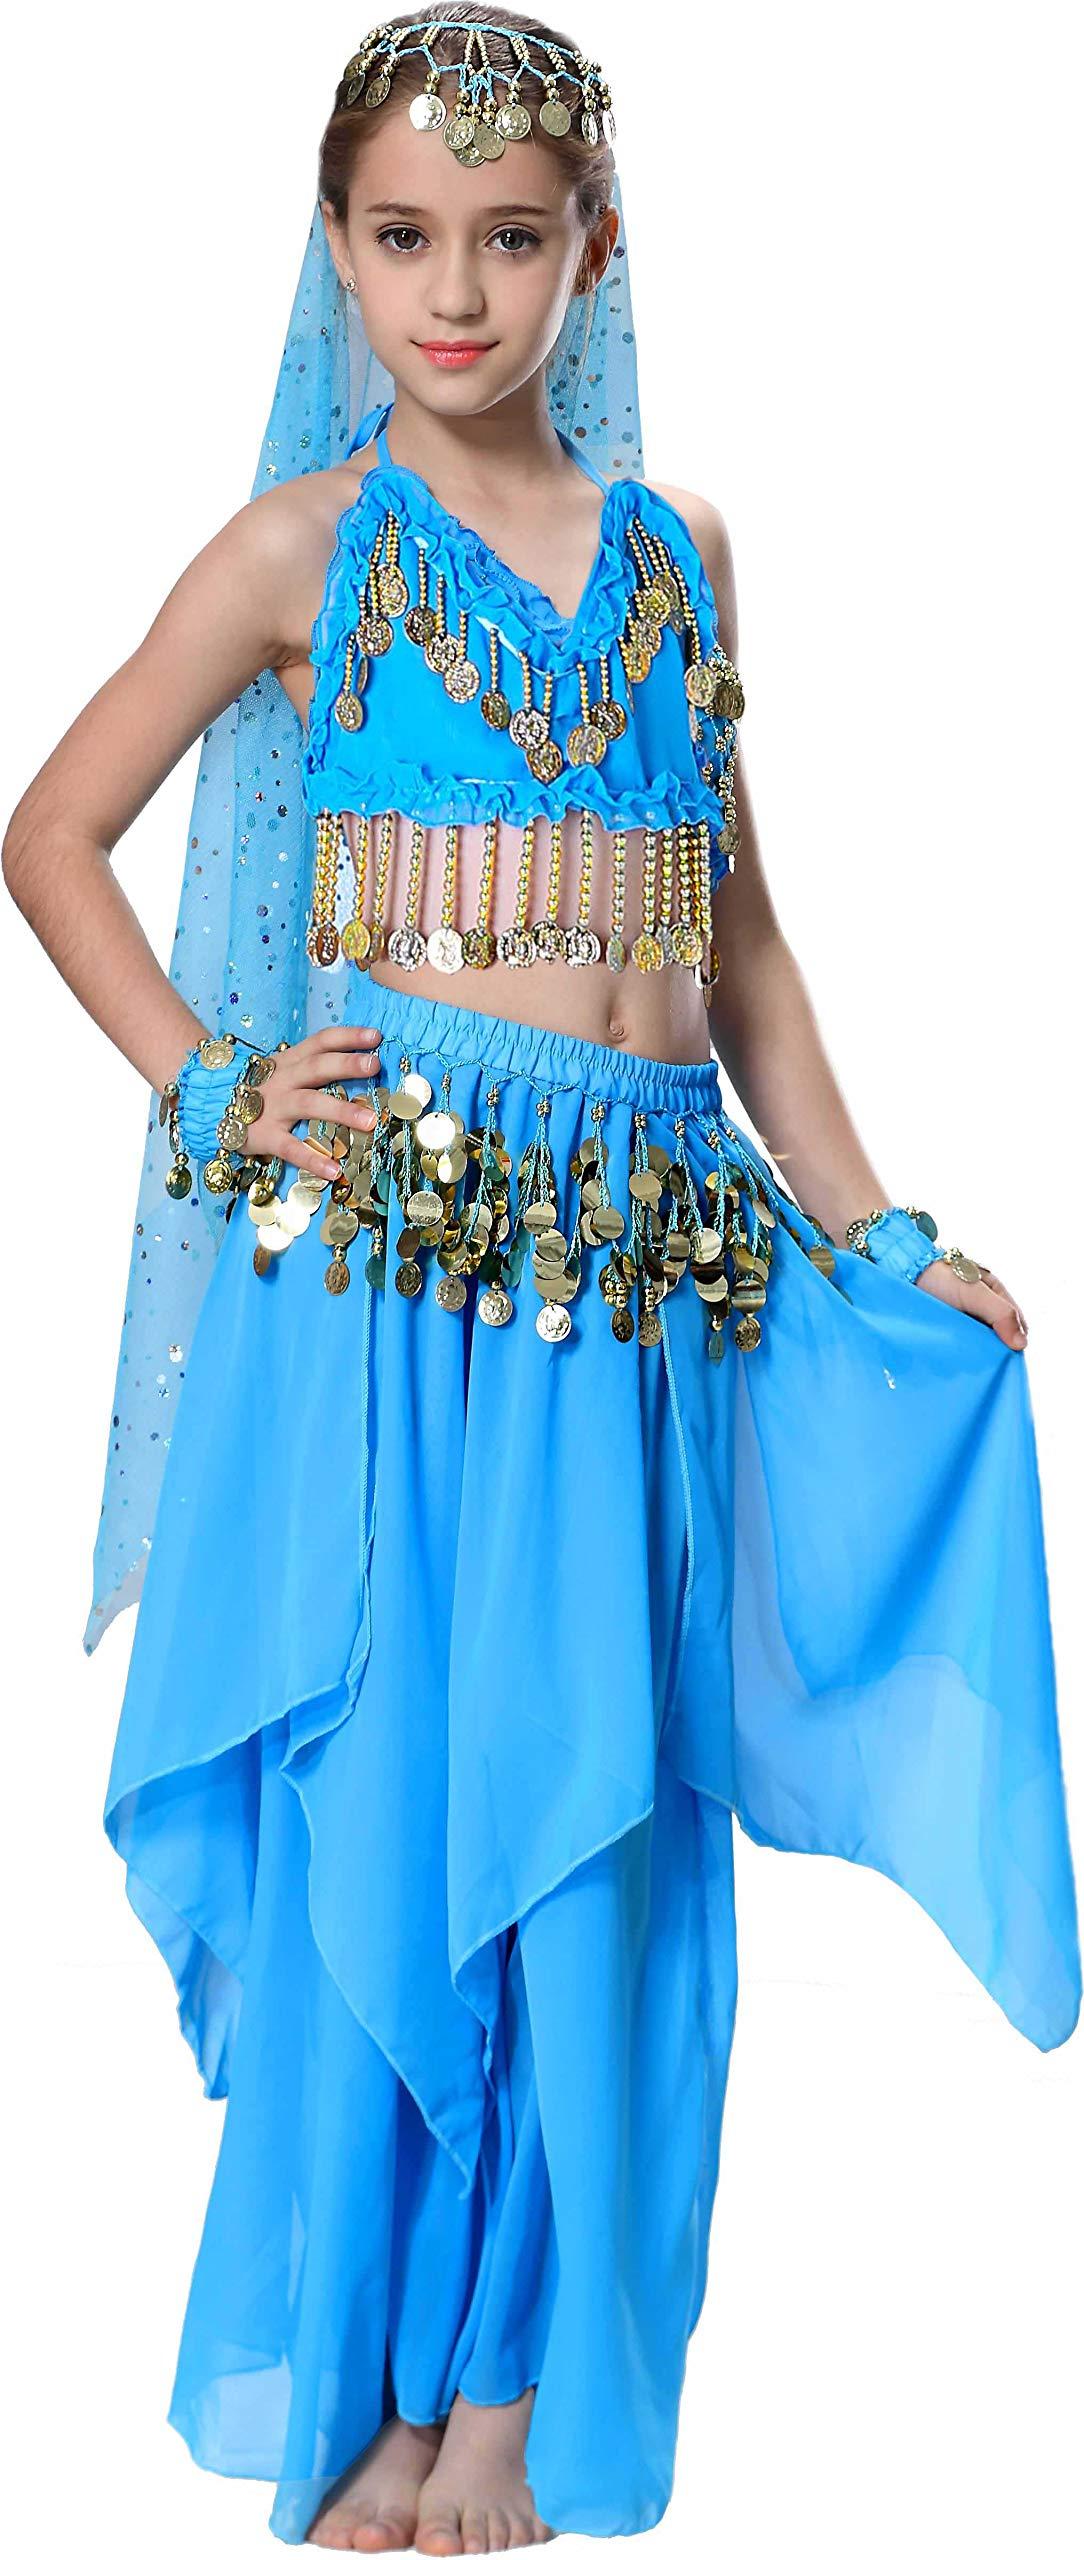 Toddler Aladdin Costume Kids Jasmine Genie Halloween Outfit Size 4t 4 5 6 7 8 10 12 14 16 Blue